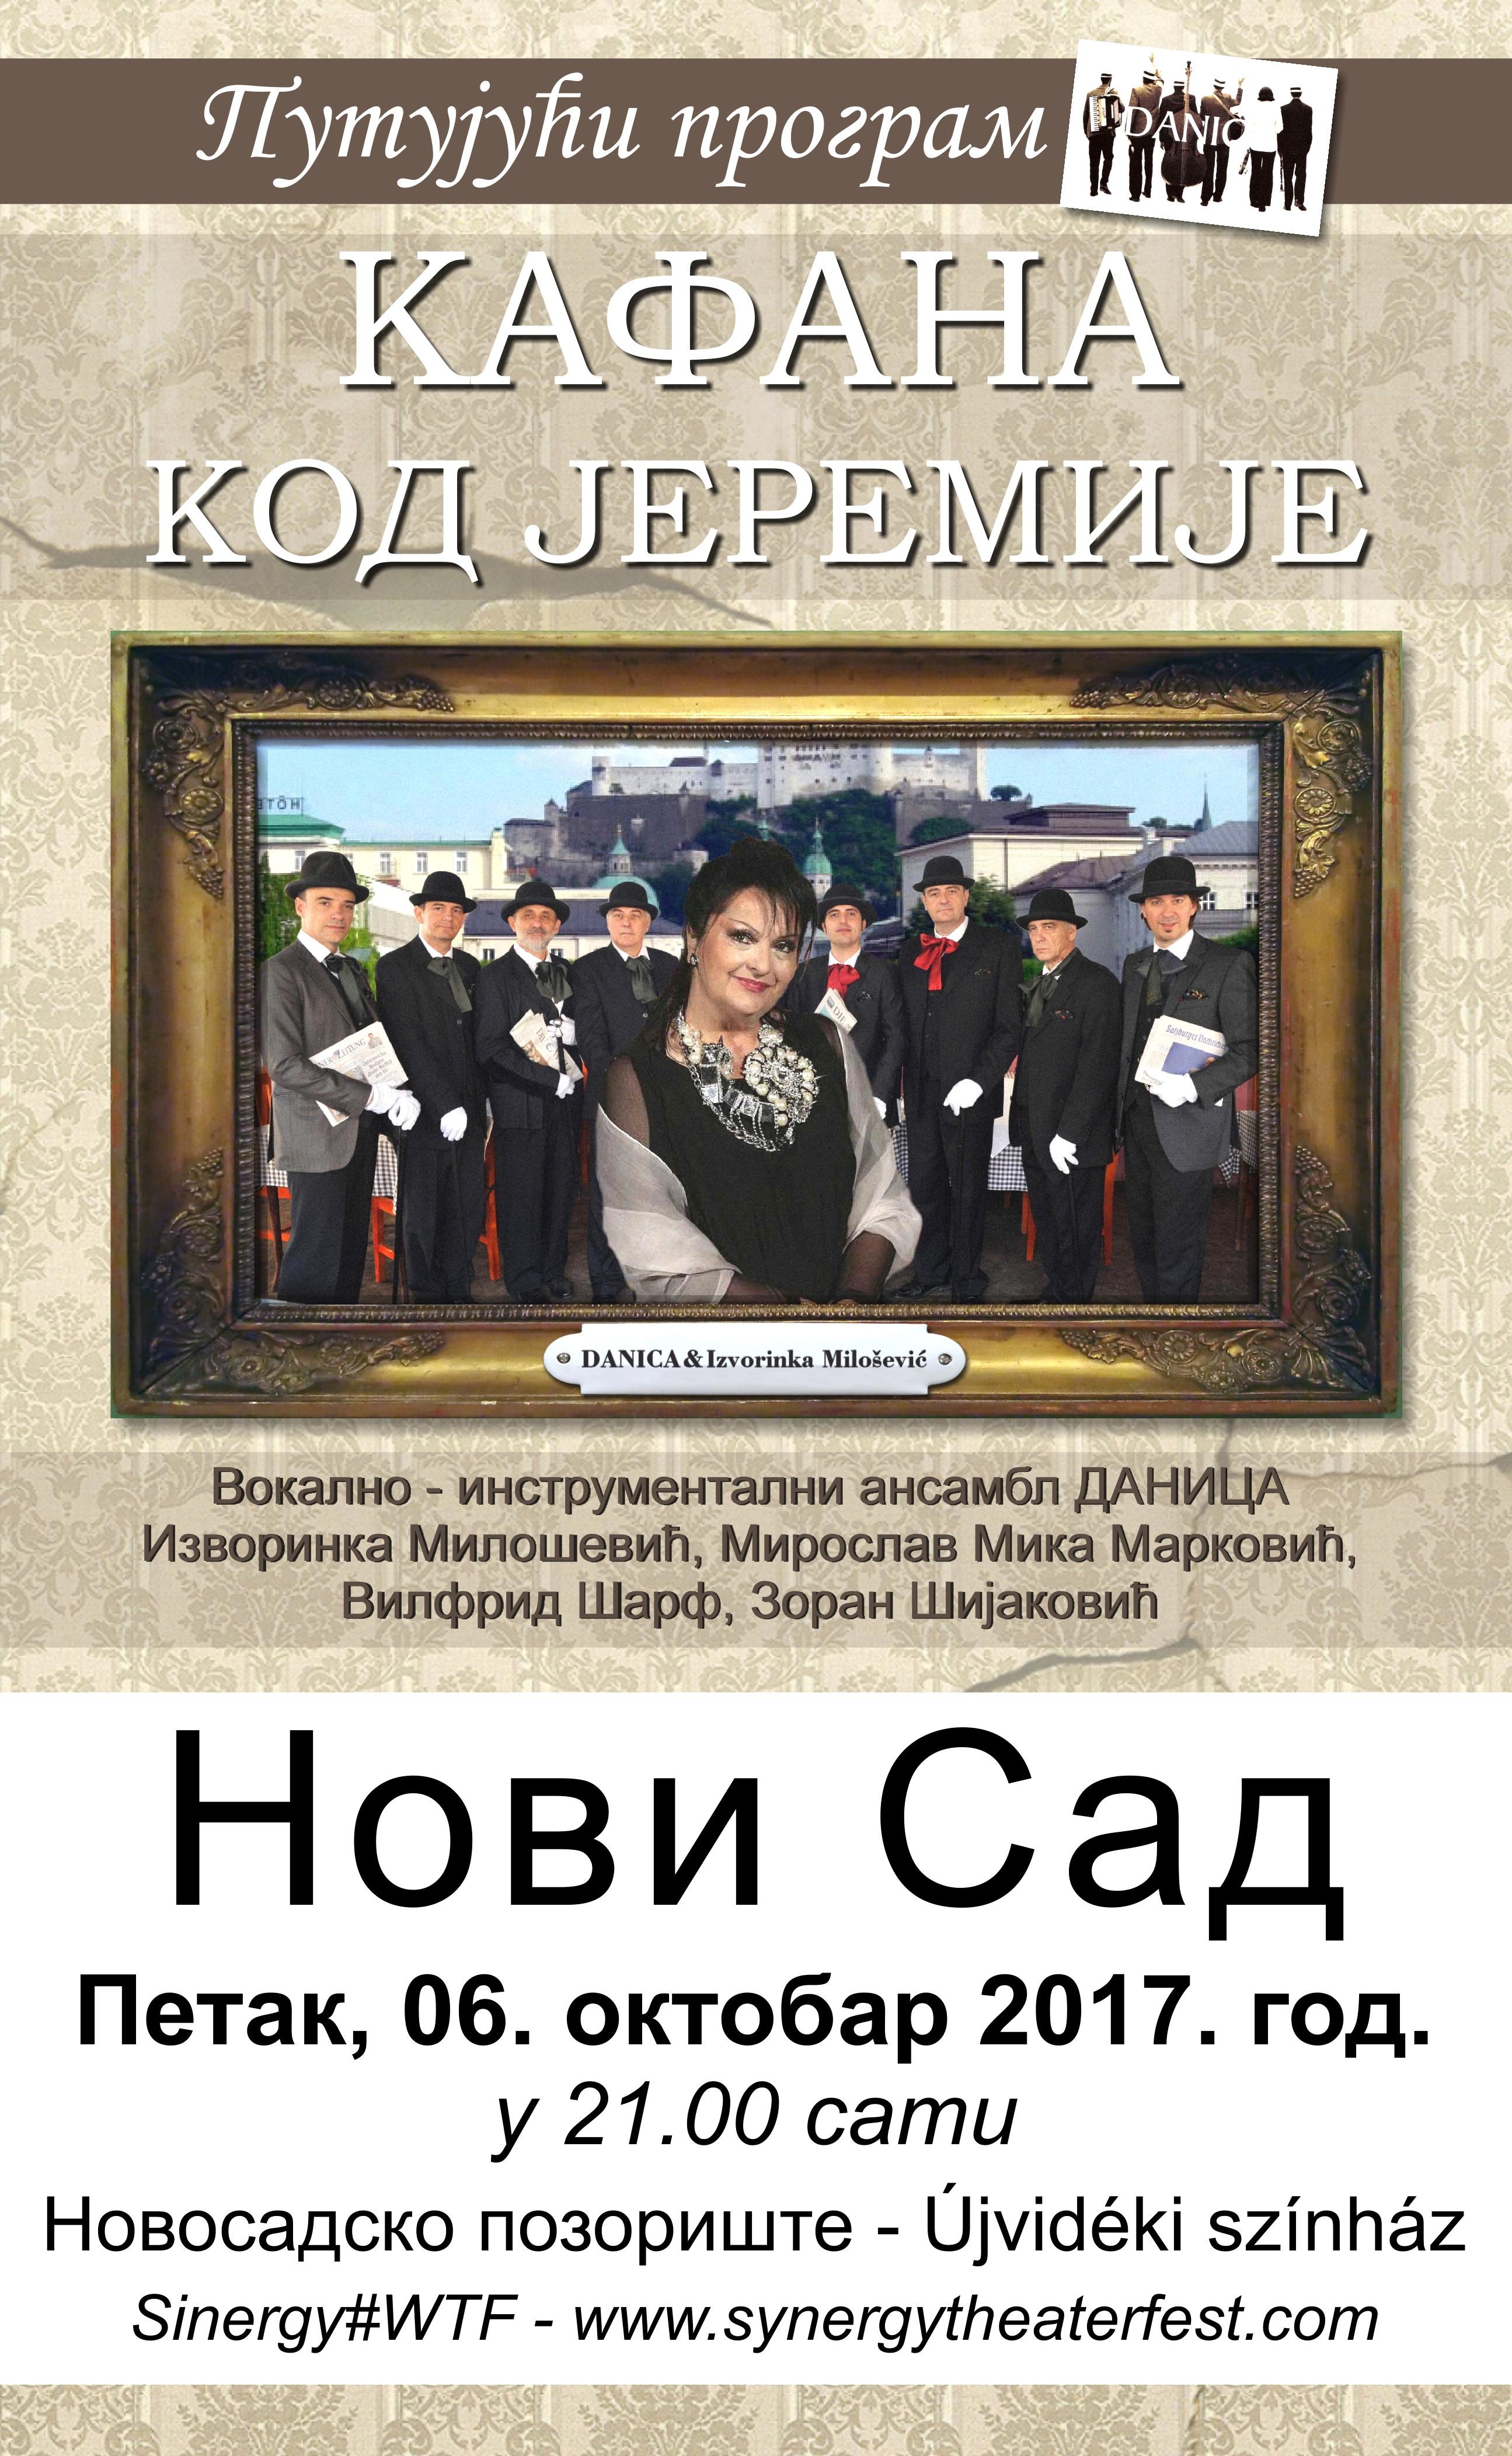 Plakat Novi Sad_Okt. 2017_1